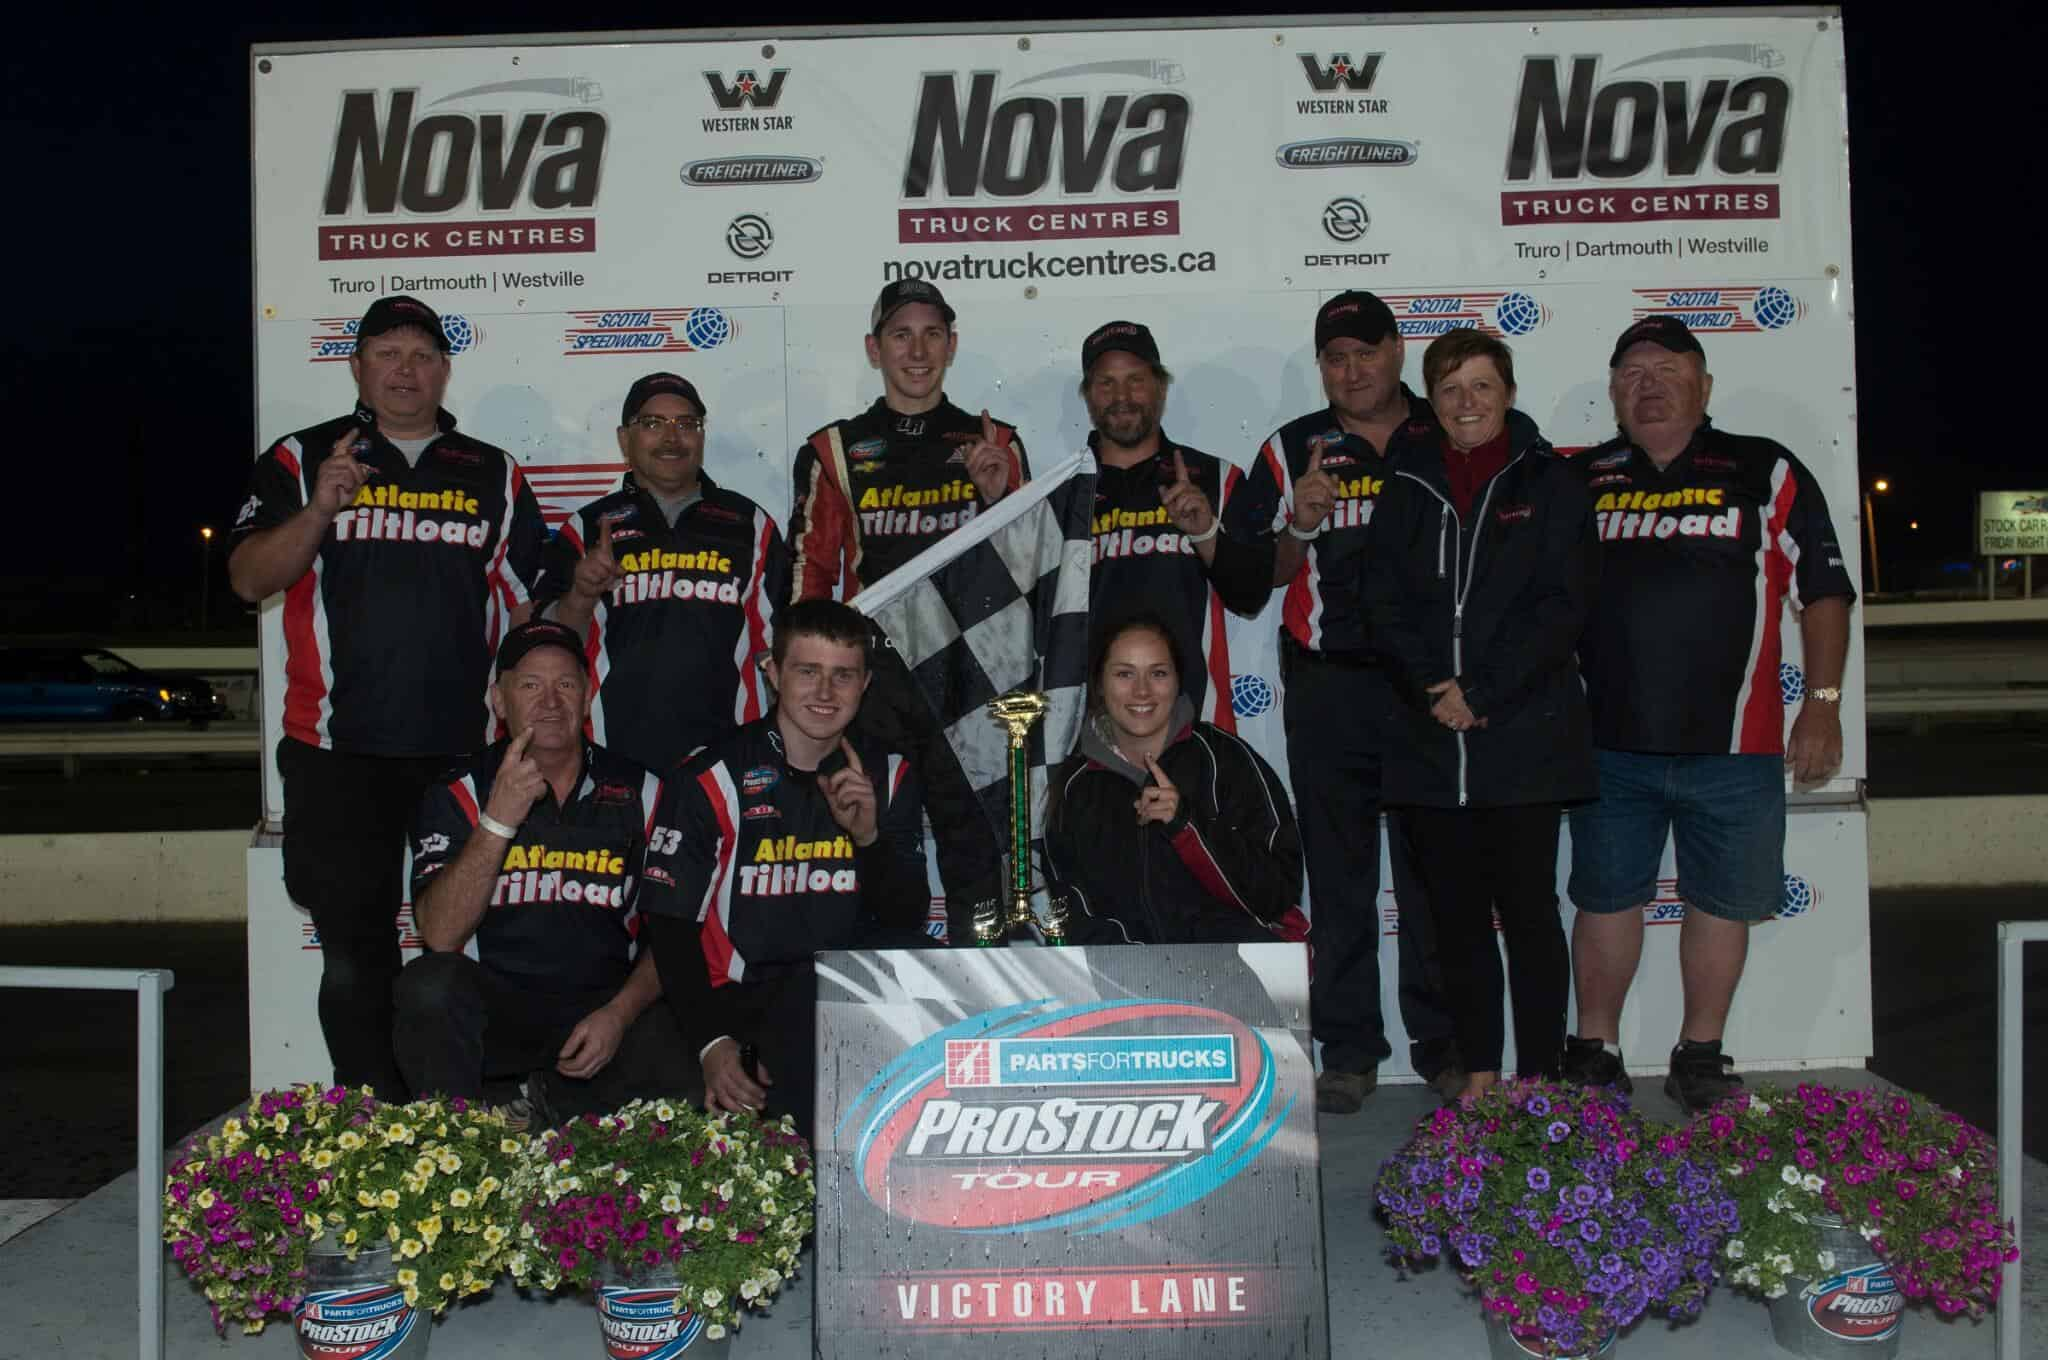 Butcher team shot on podium